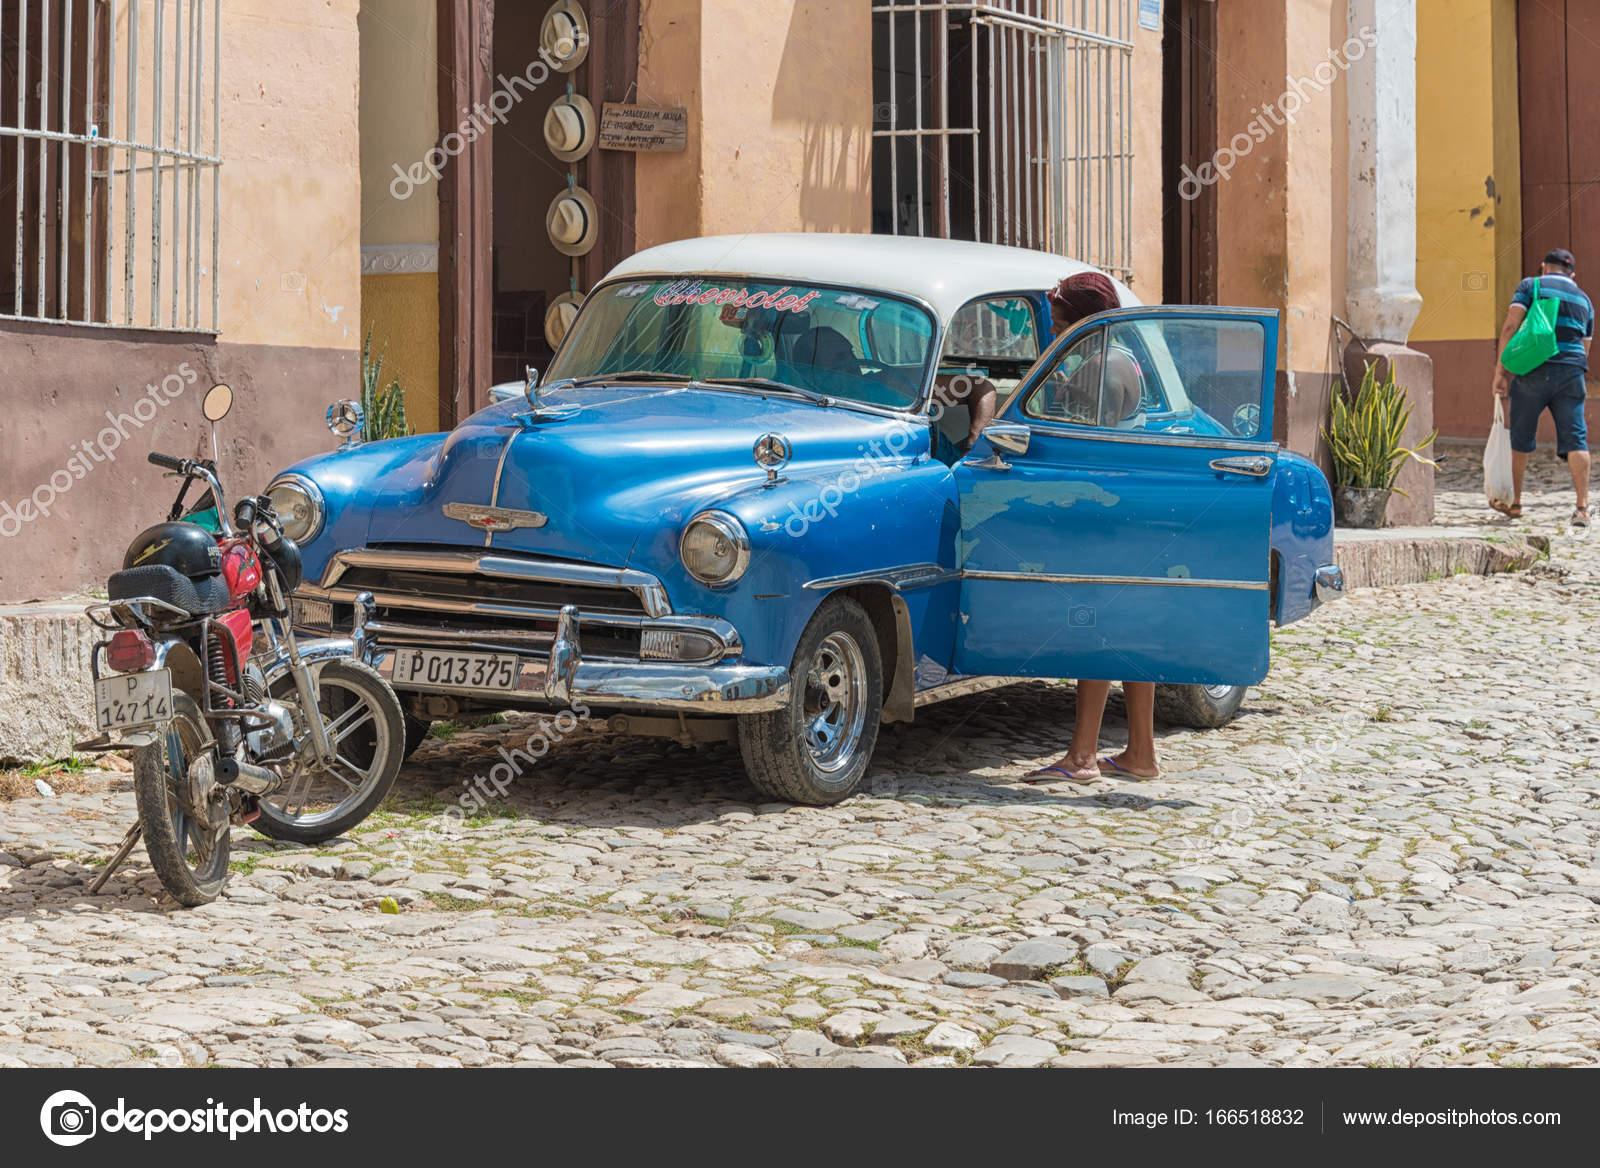 Trinidad,Cuba: Old Chevrolet car in cobblestone street – Stock ...